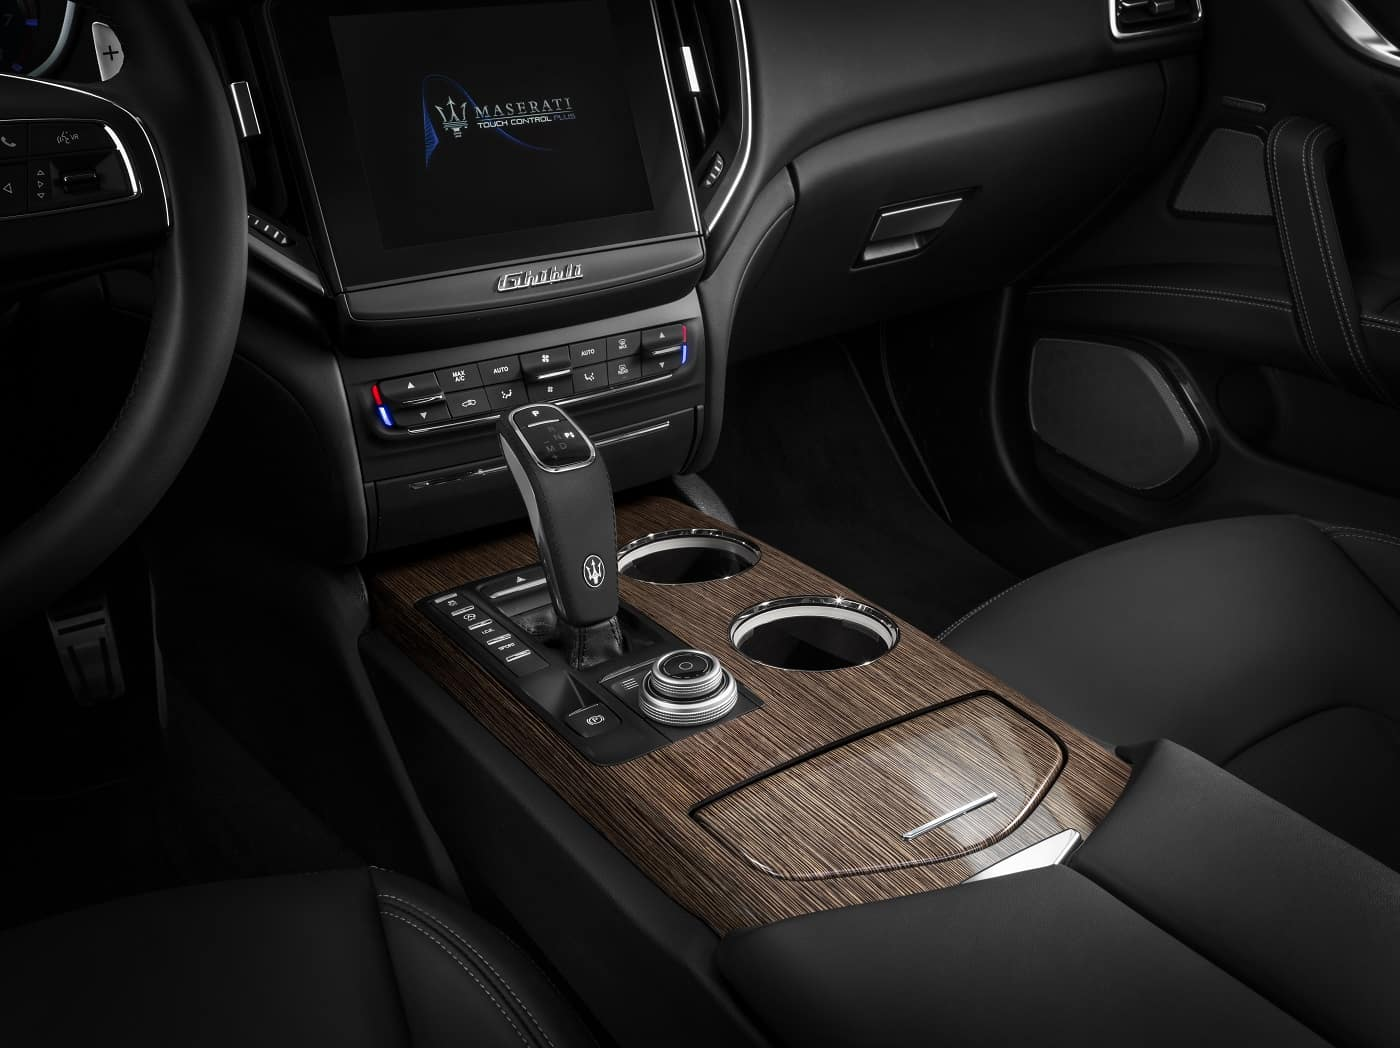 2020 Maserati Ghibli Interior Technology